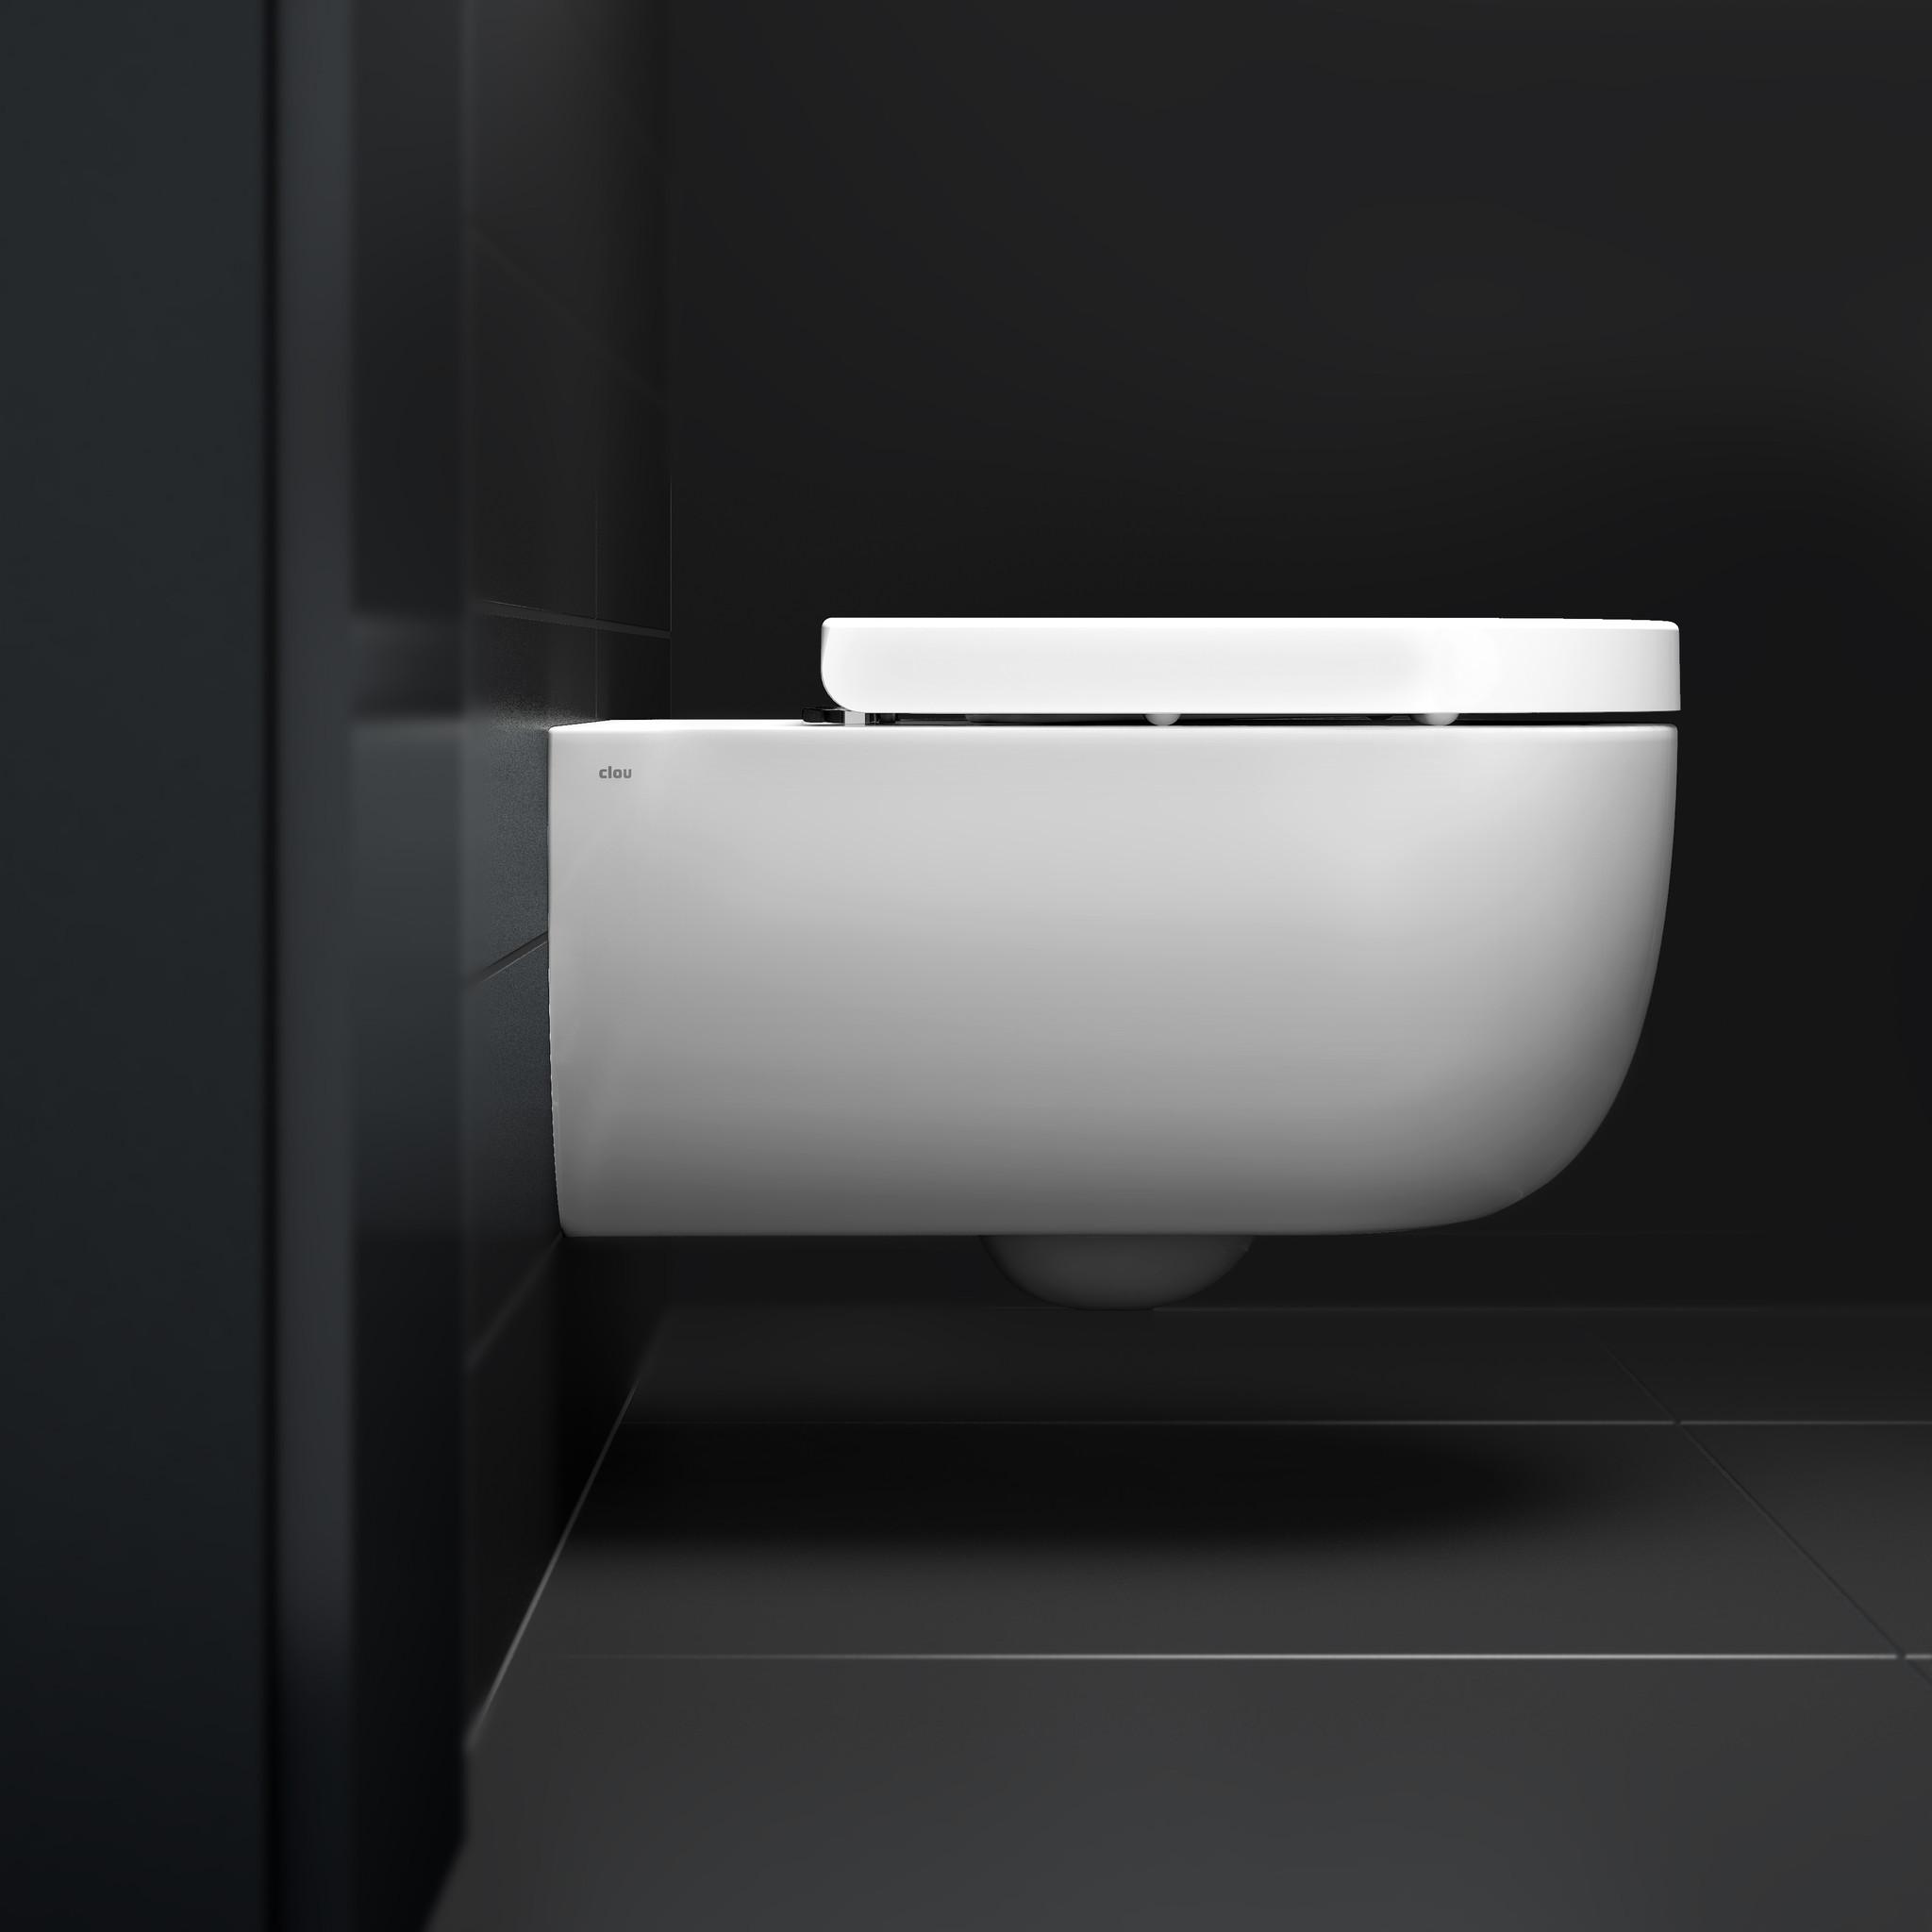 Hammock toilette 56cm sans bord, avec abattant